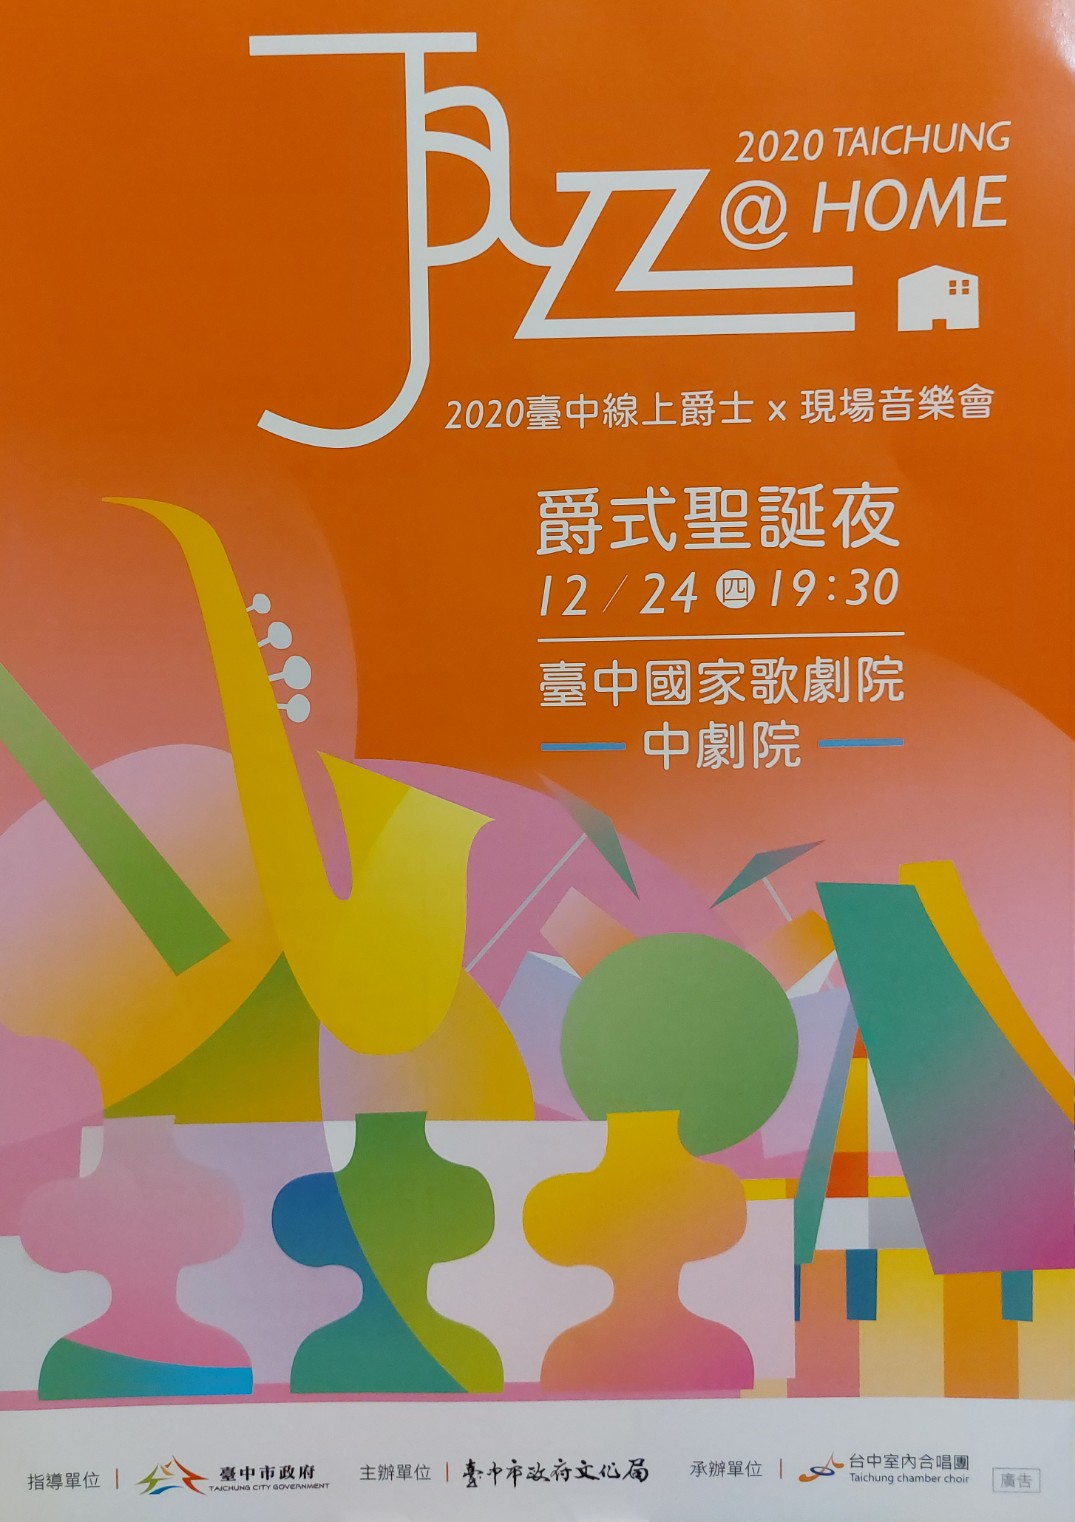 Guest conductorship: Taichung Chamber Choir (Jazz @ Home concert, 24th Dec. 2020)